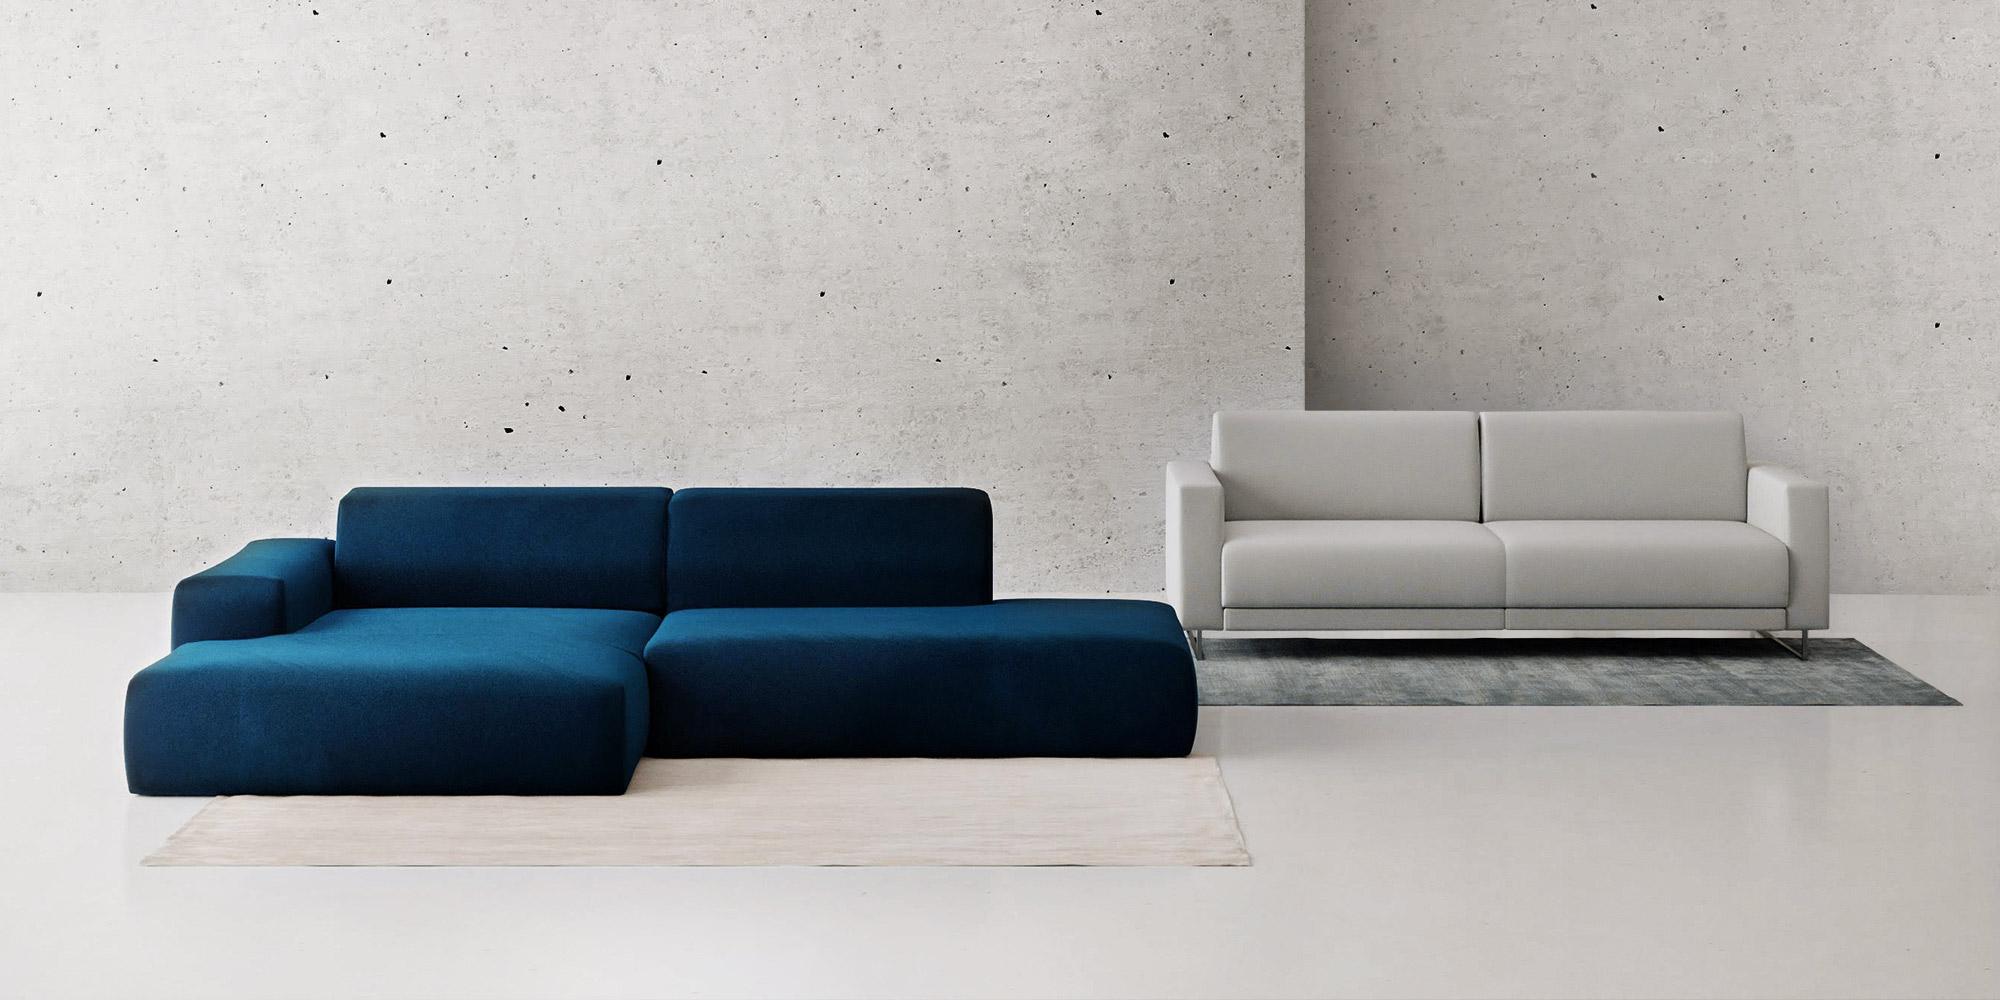 blue and grey sofas